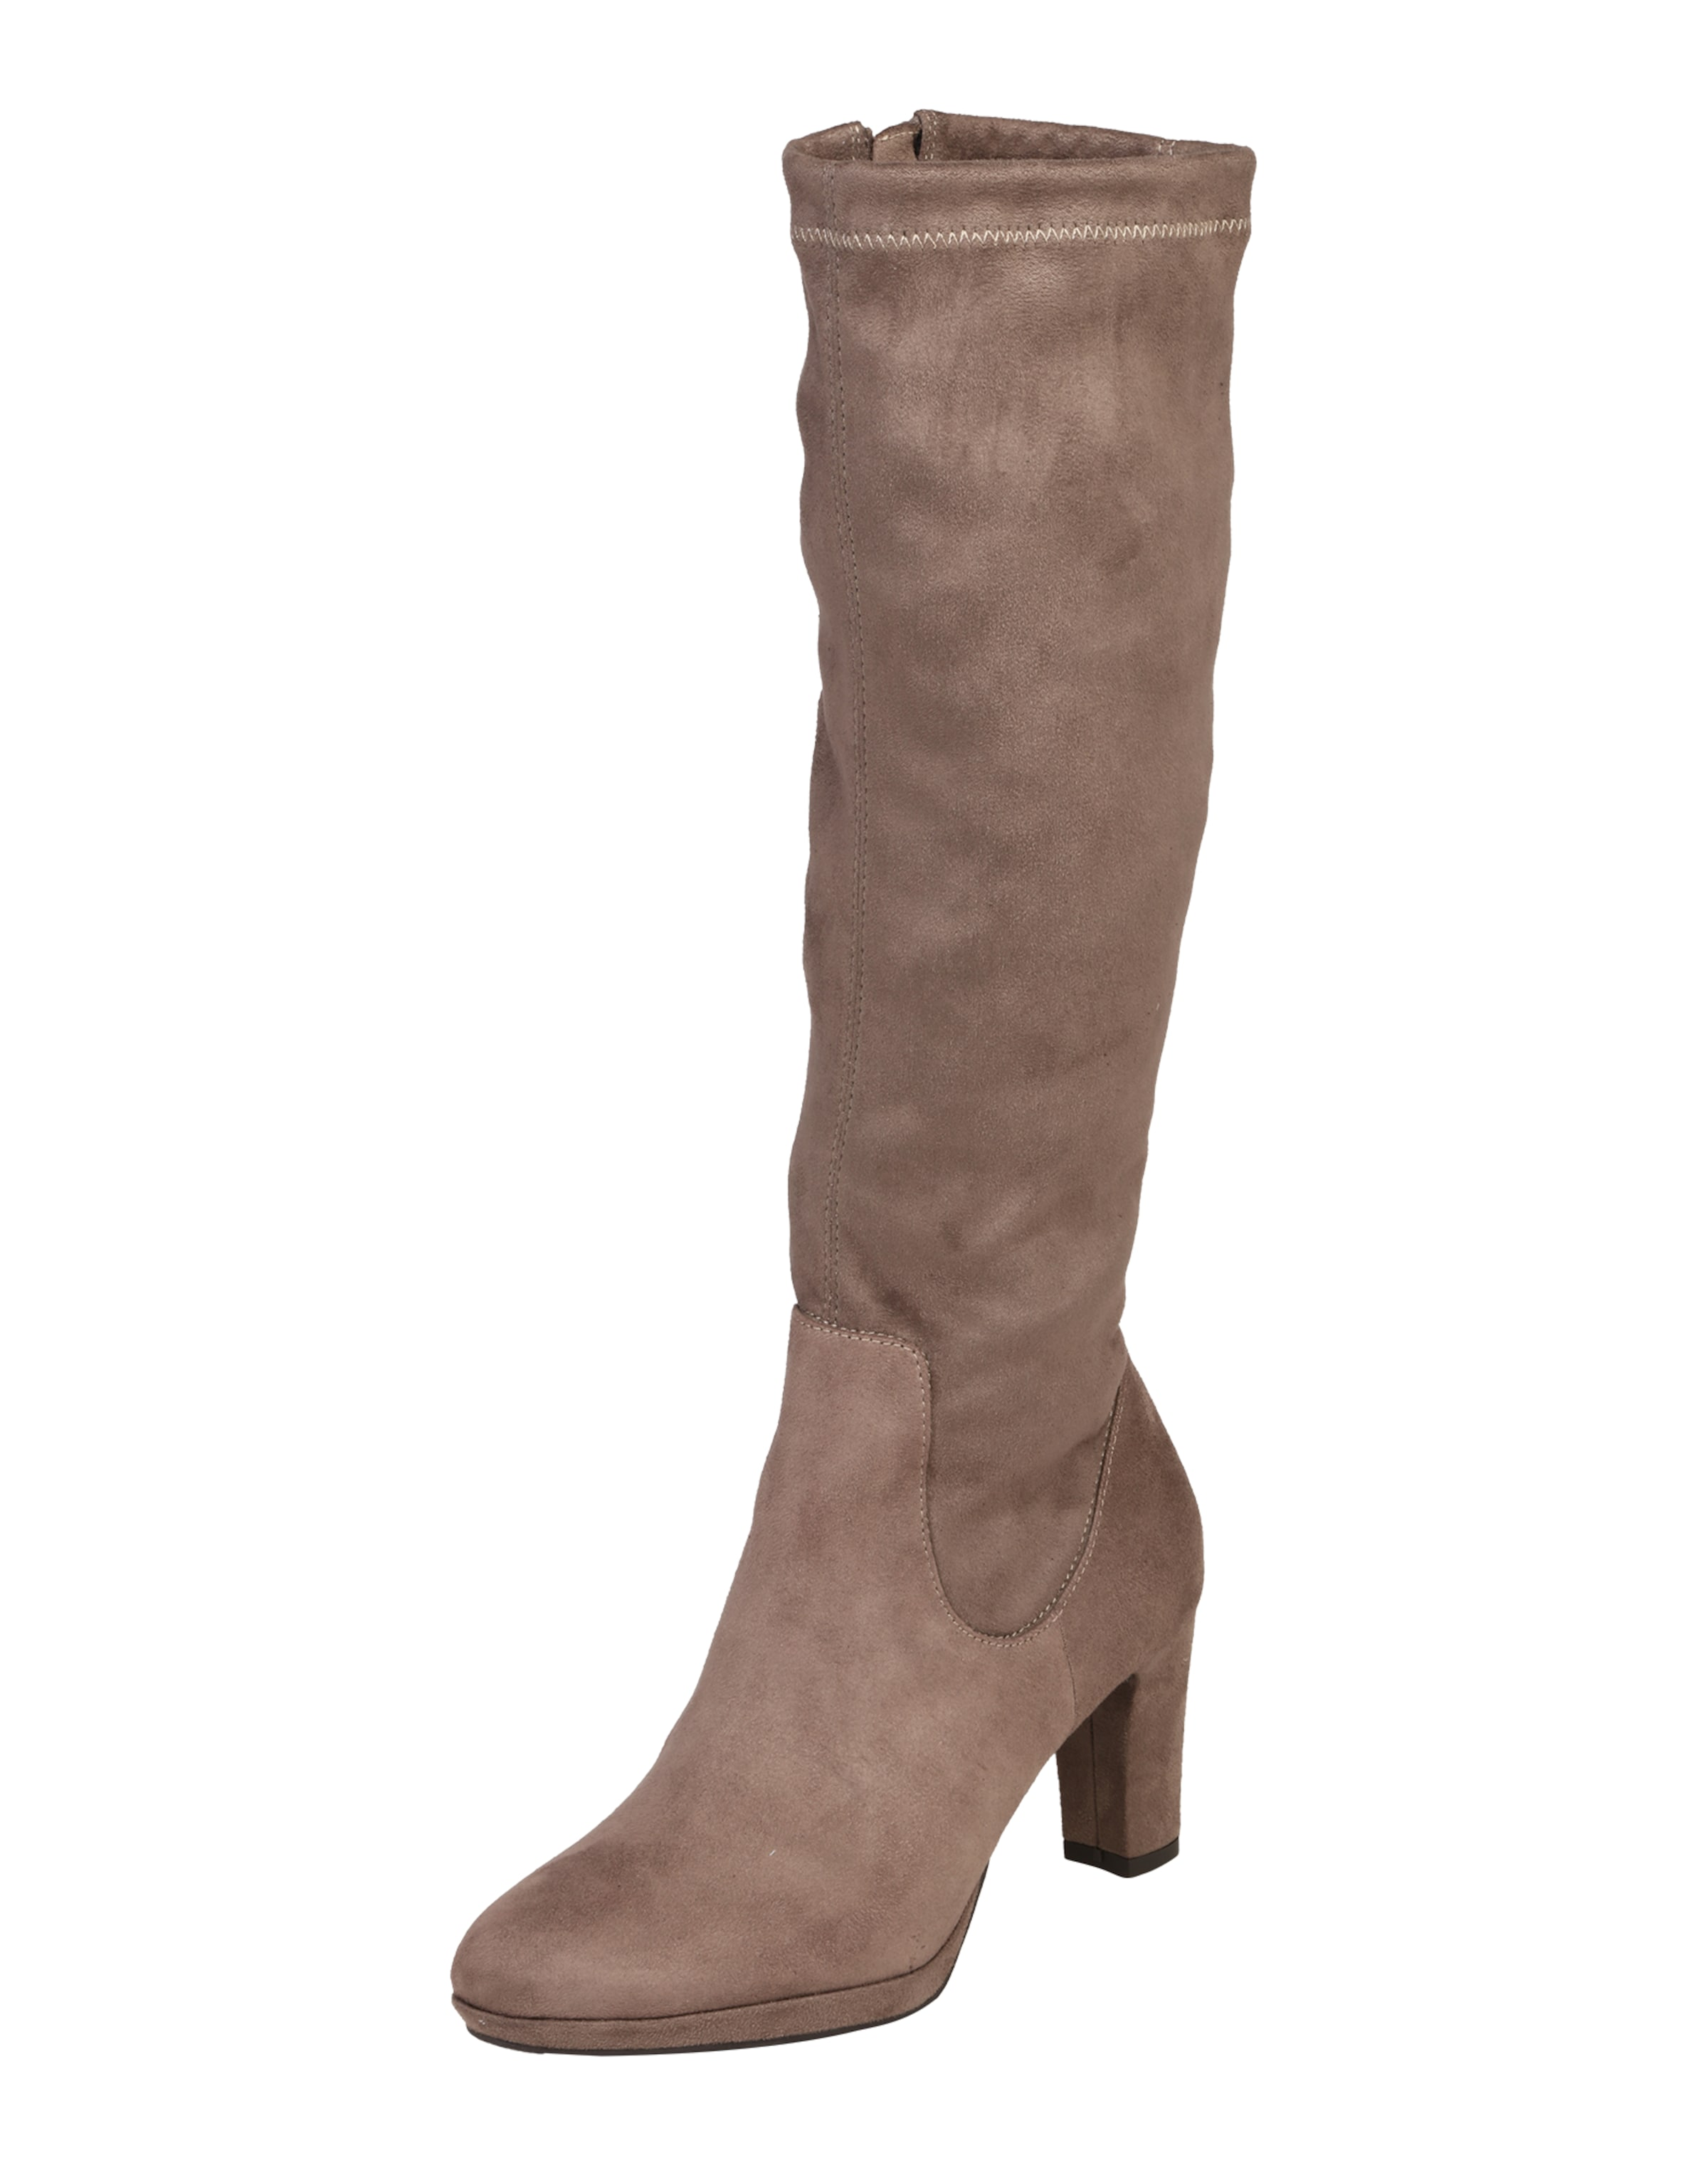 TAMARIS Langschaft-Stiefel in Veloursleder-Optik Verschleißfeste billige Schuhe